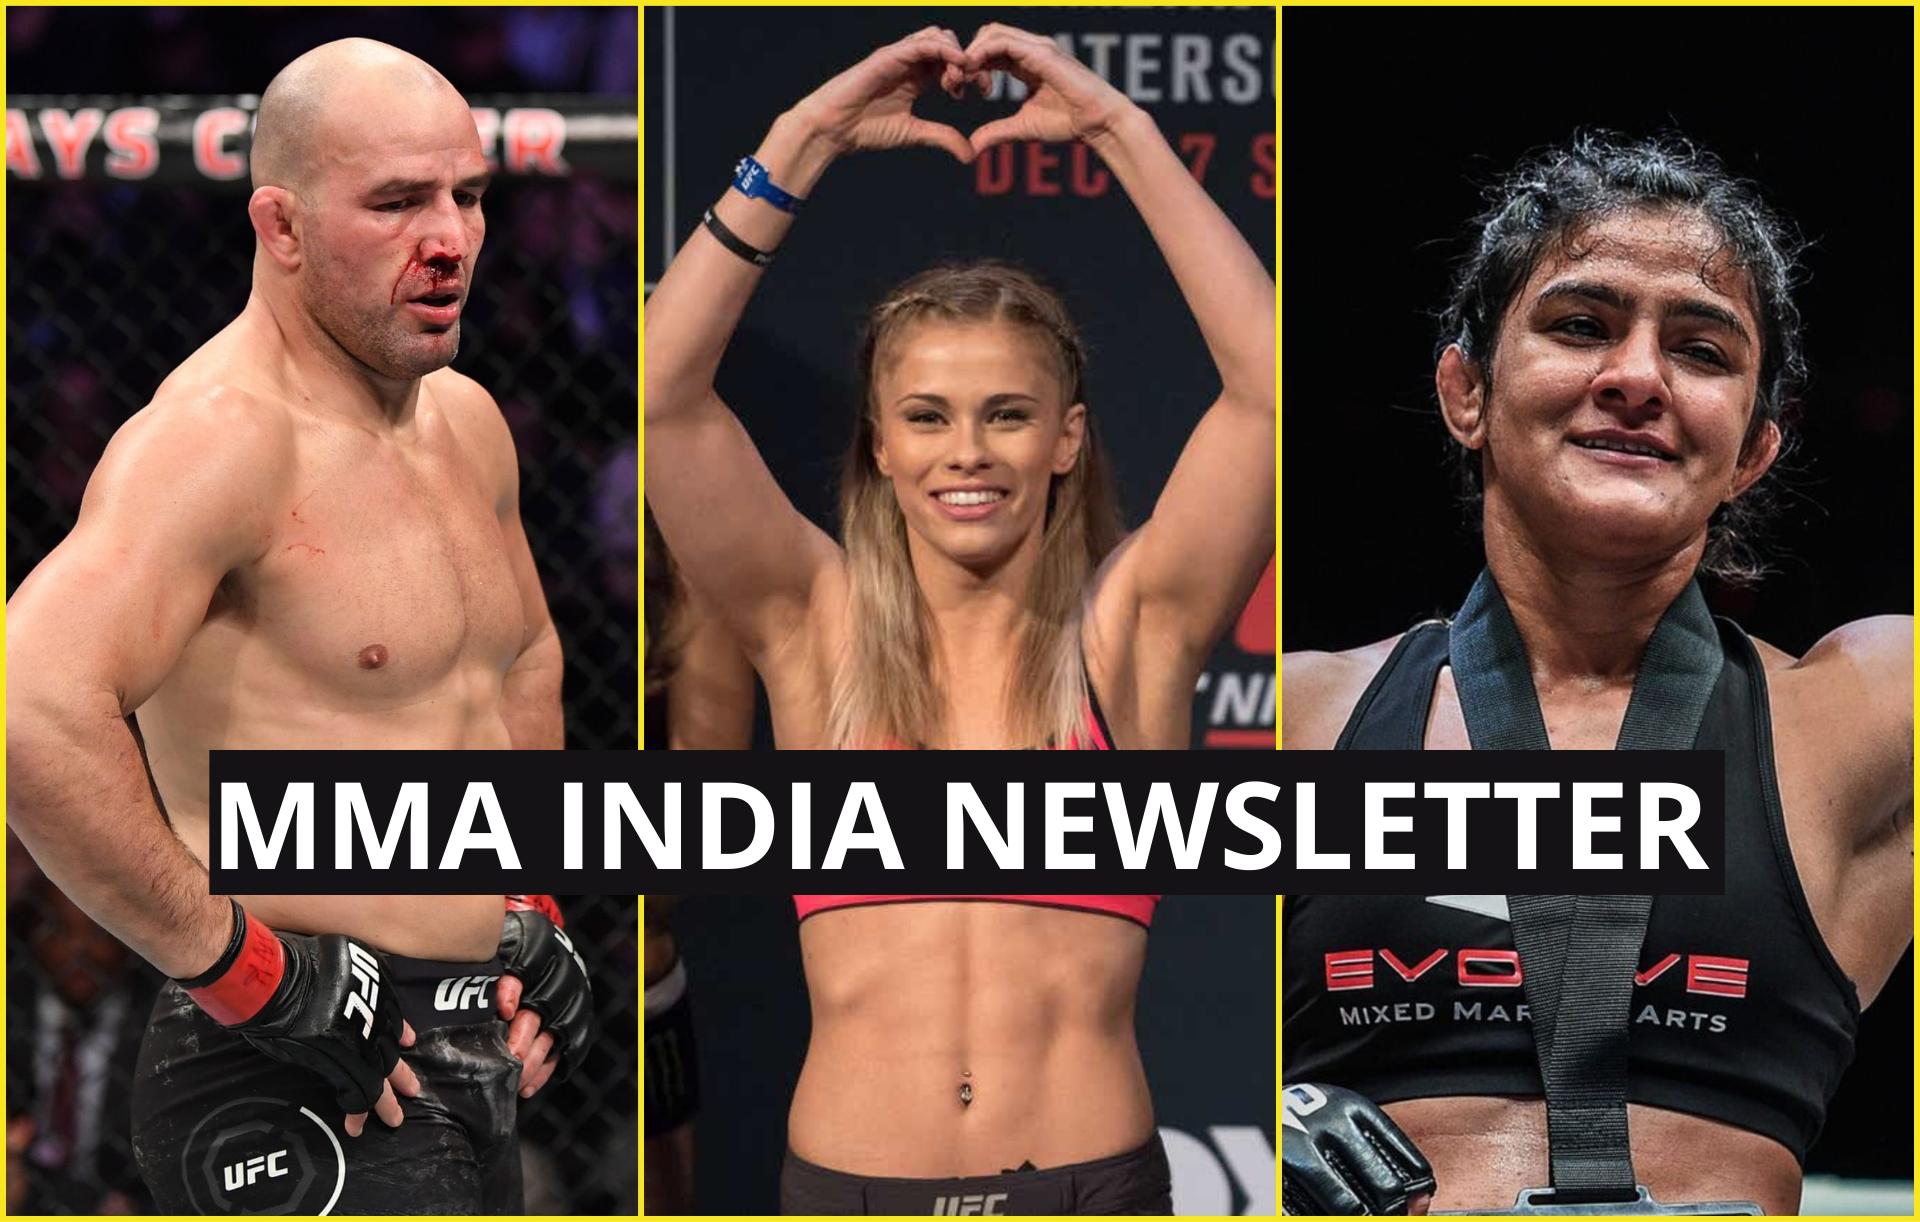 MMA India's Weekly Roundup (3 - 9 November): Ritu Phogat's next fight confirmed, Teixeira to get next title shot? - Ritu